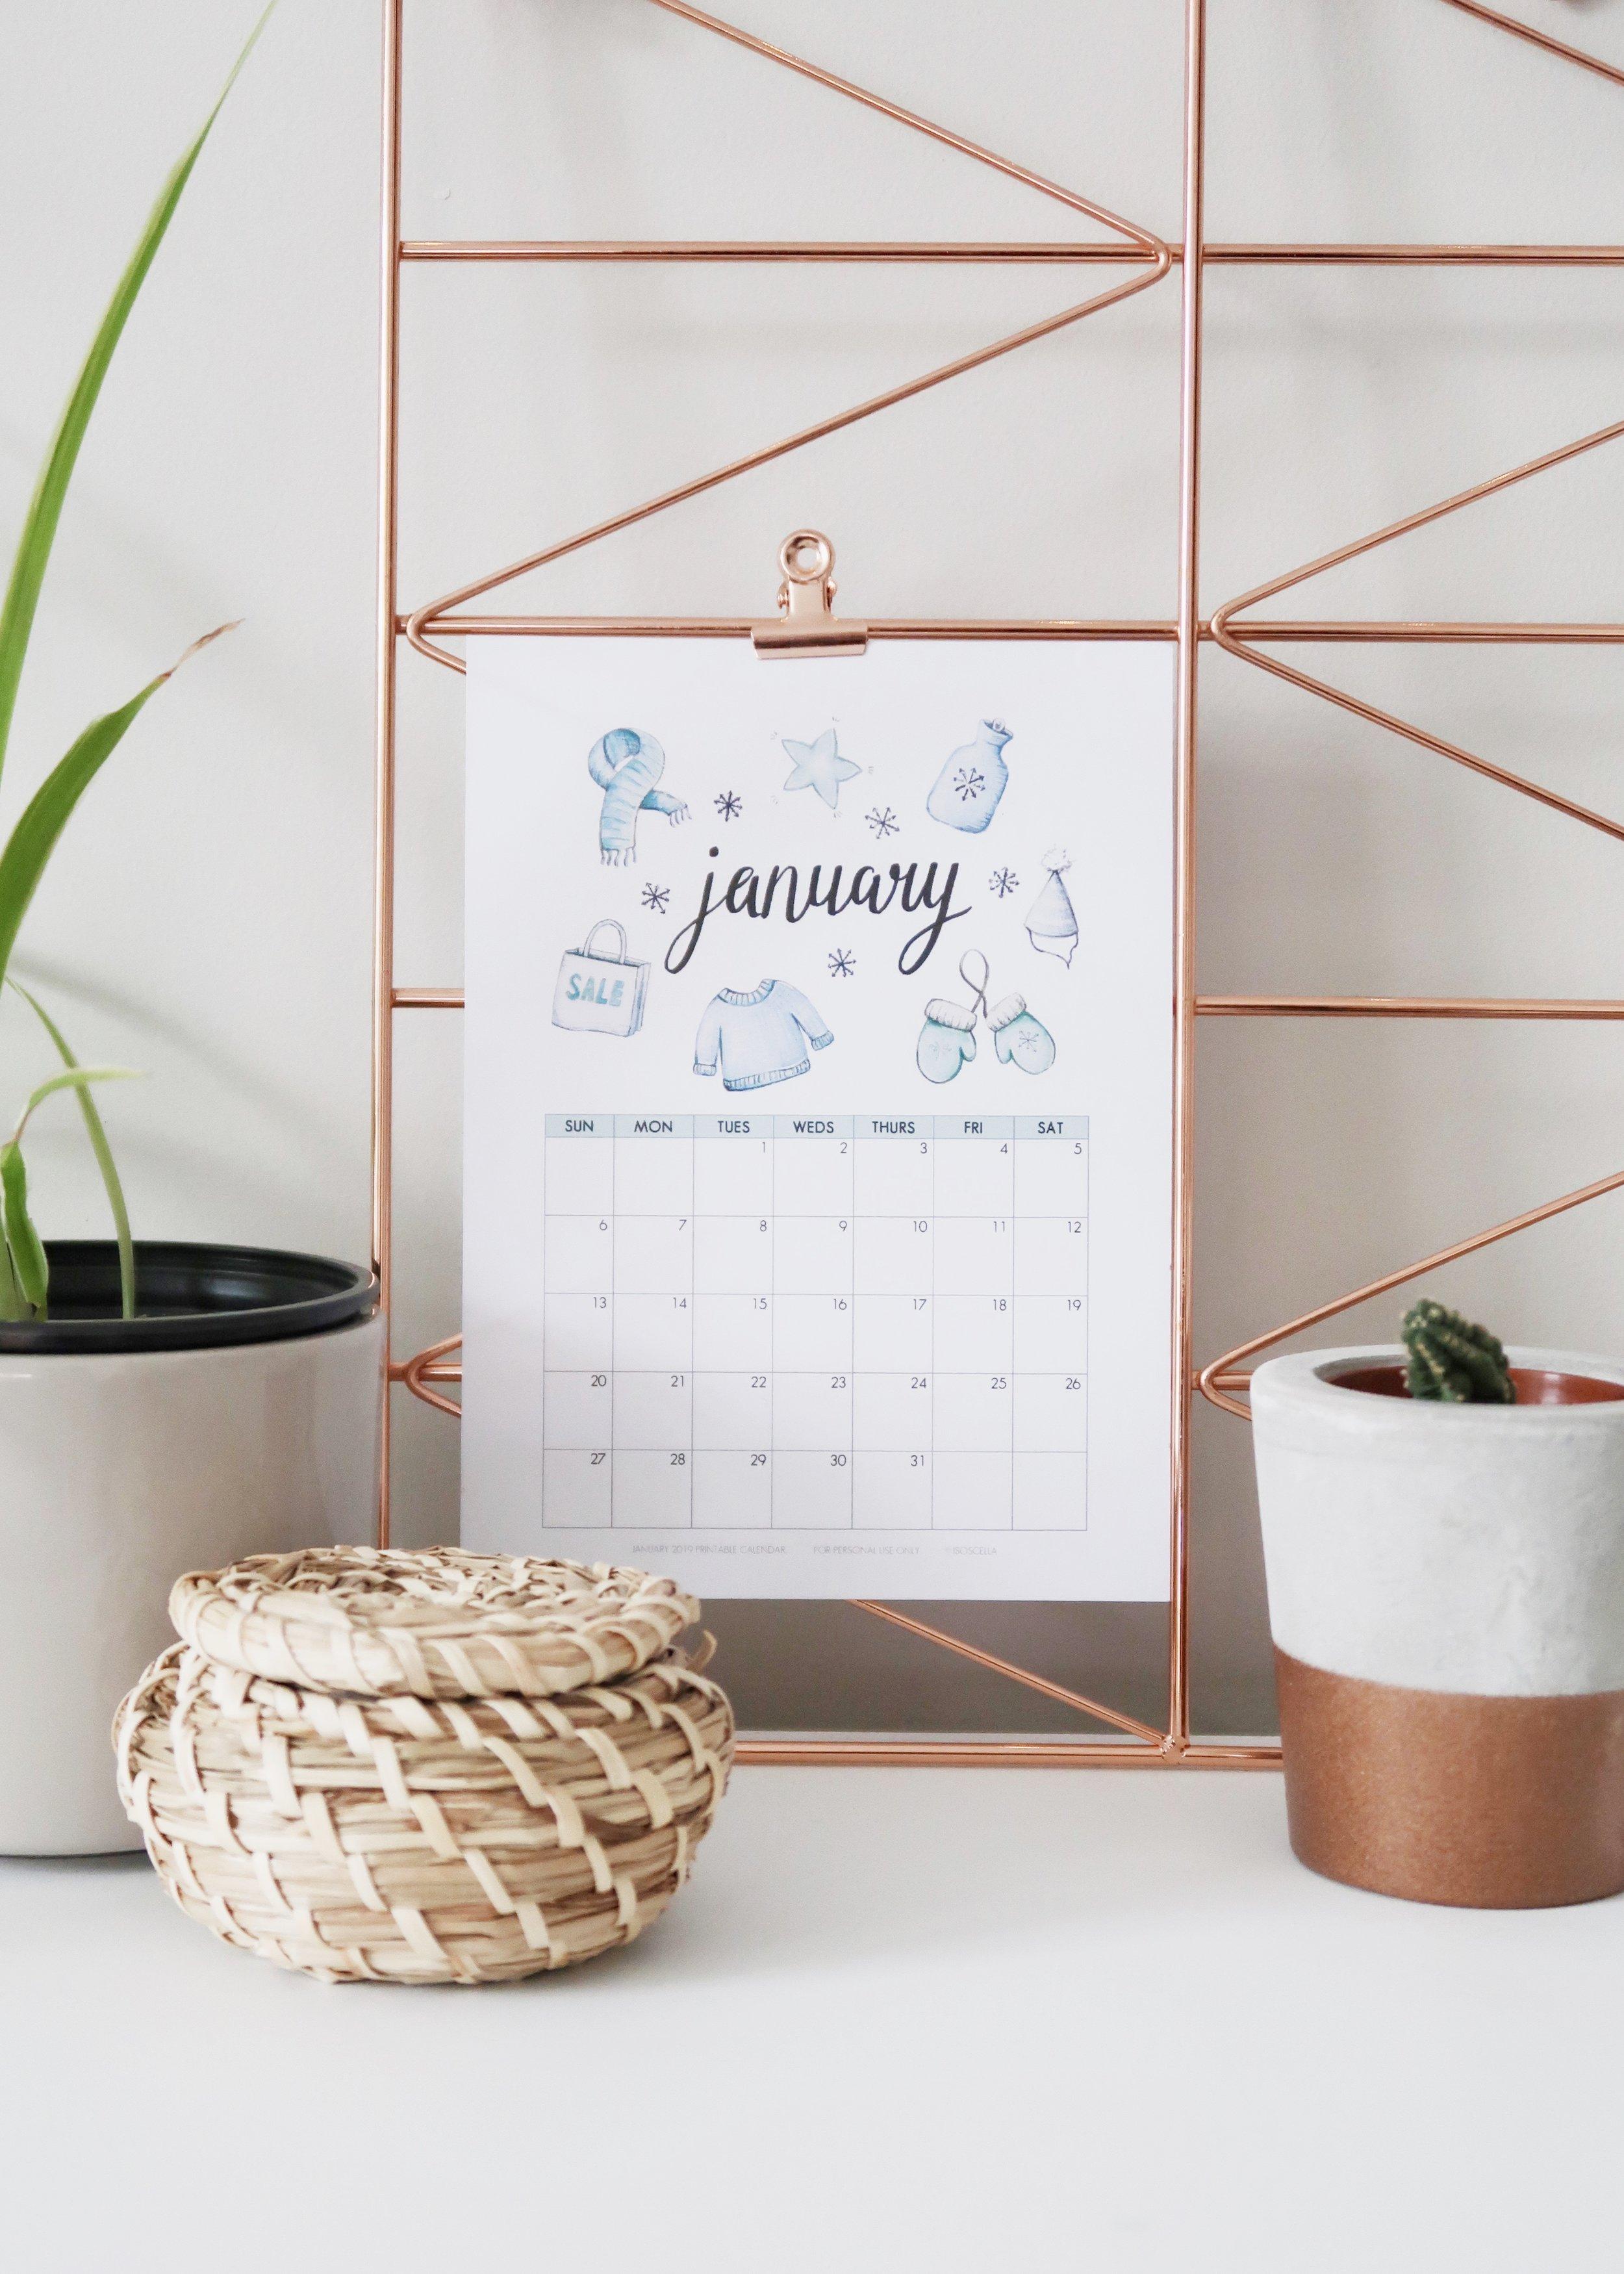 New Illustrated January 2019 Calendar (+Free Printable) by Isoscella